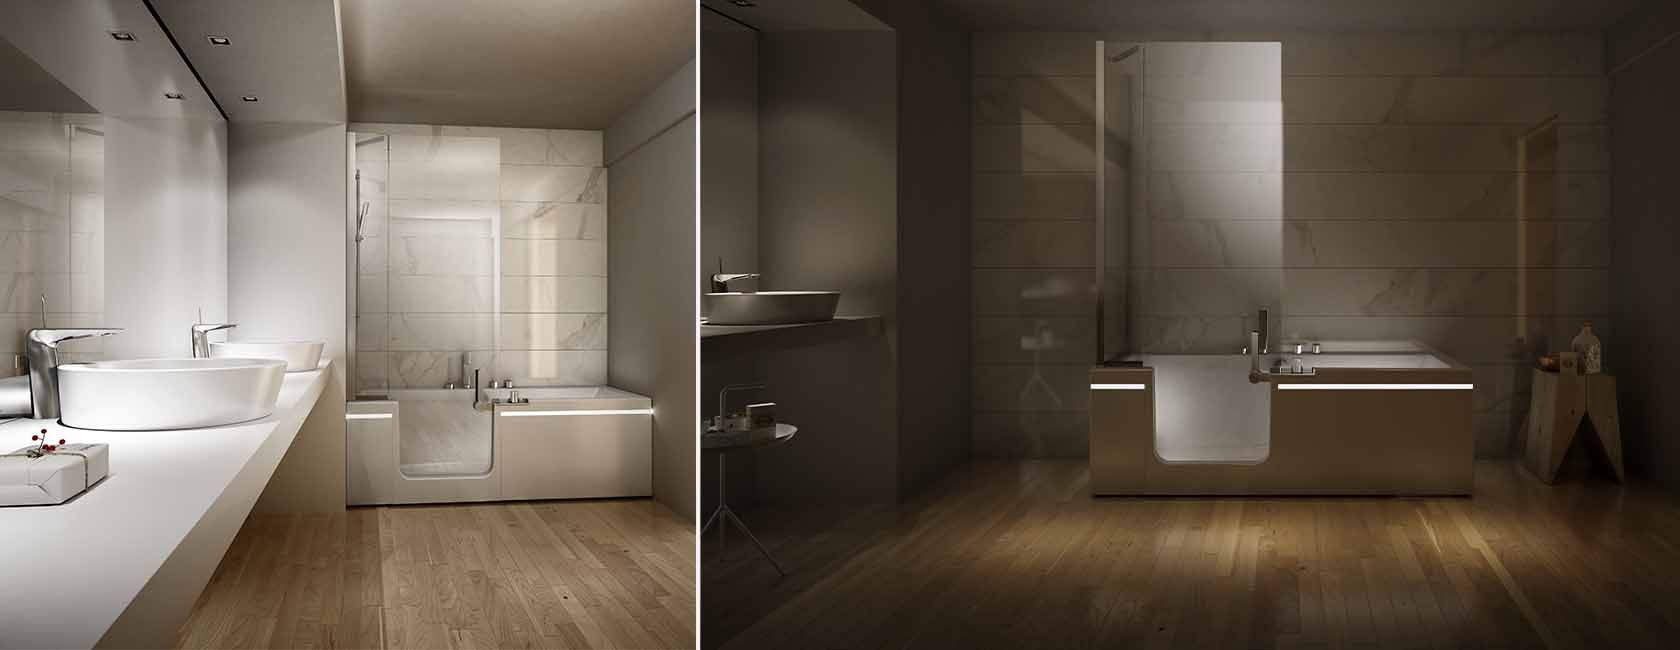 baños para discapactiados minusvalidos, bañeras para minusvalidos ...